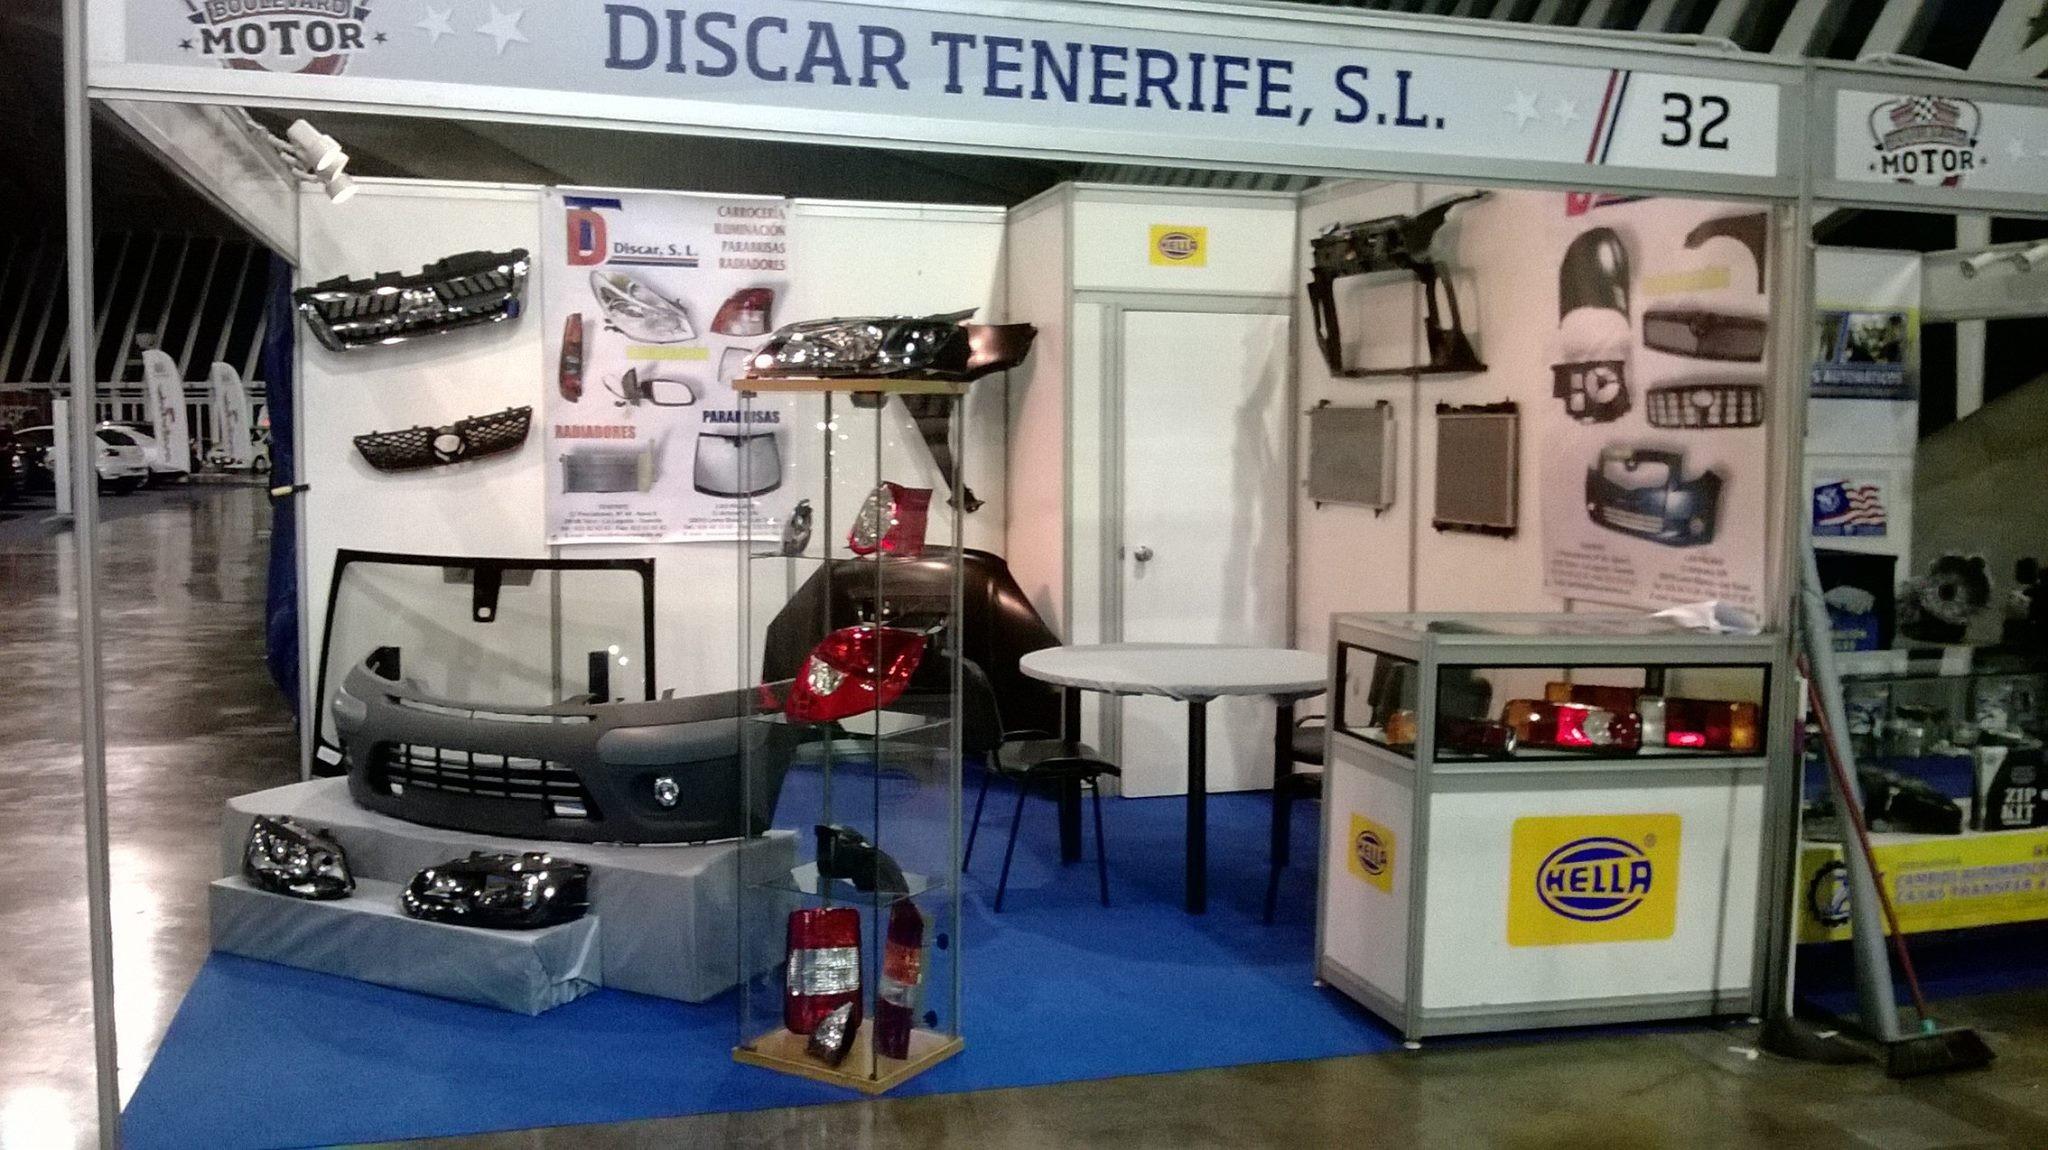 Discar Tenerife, SL